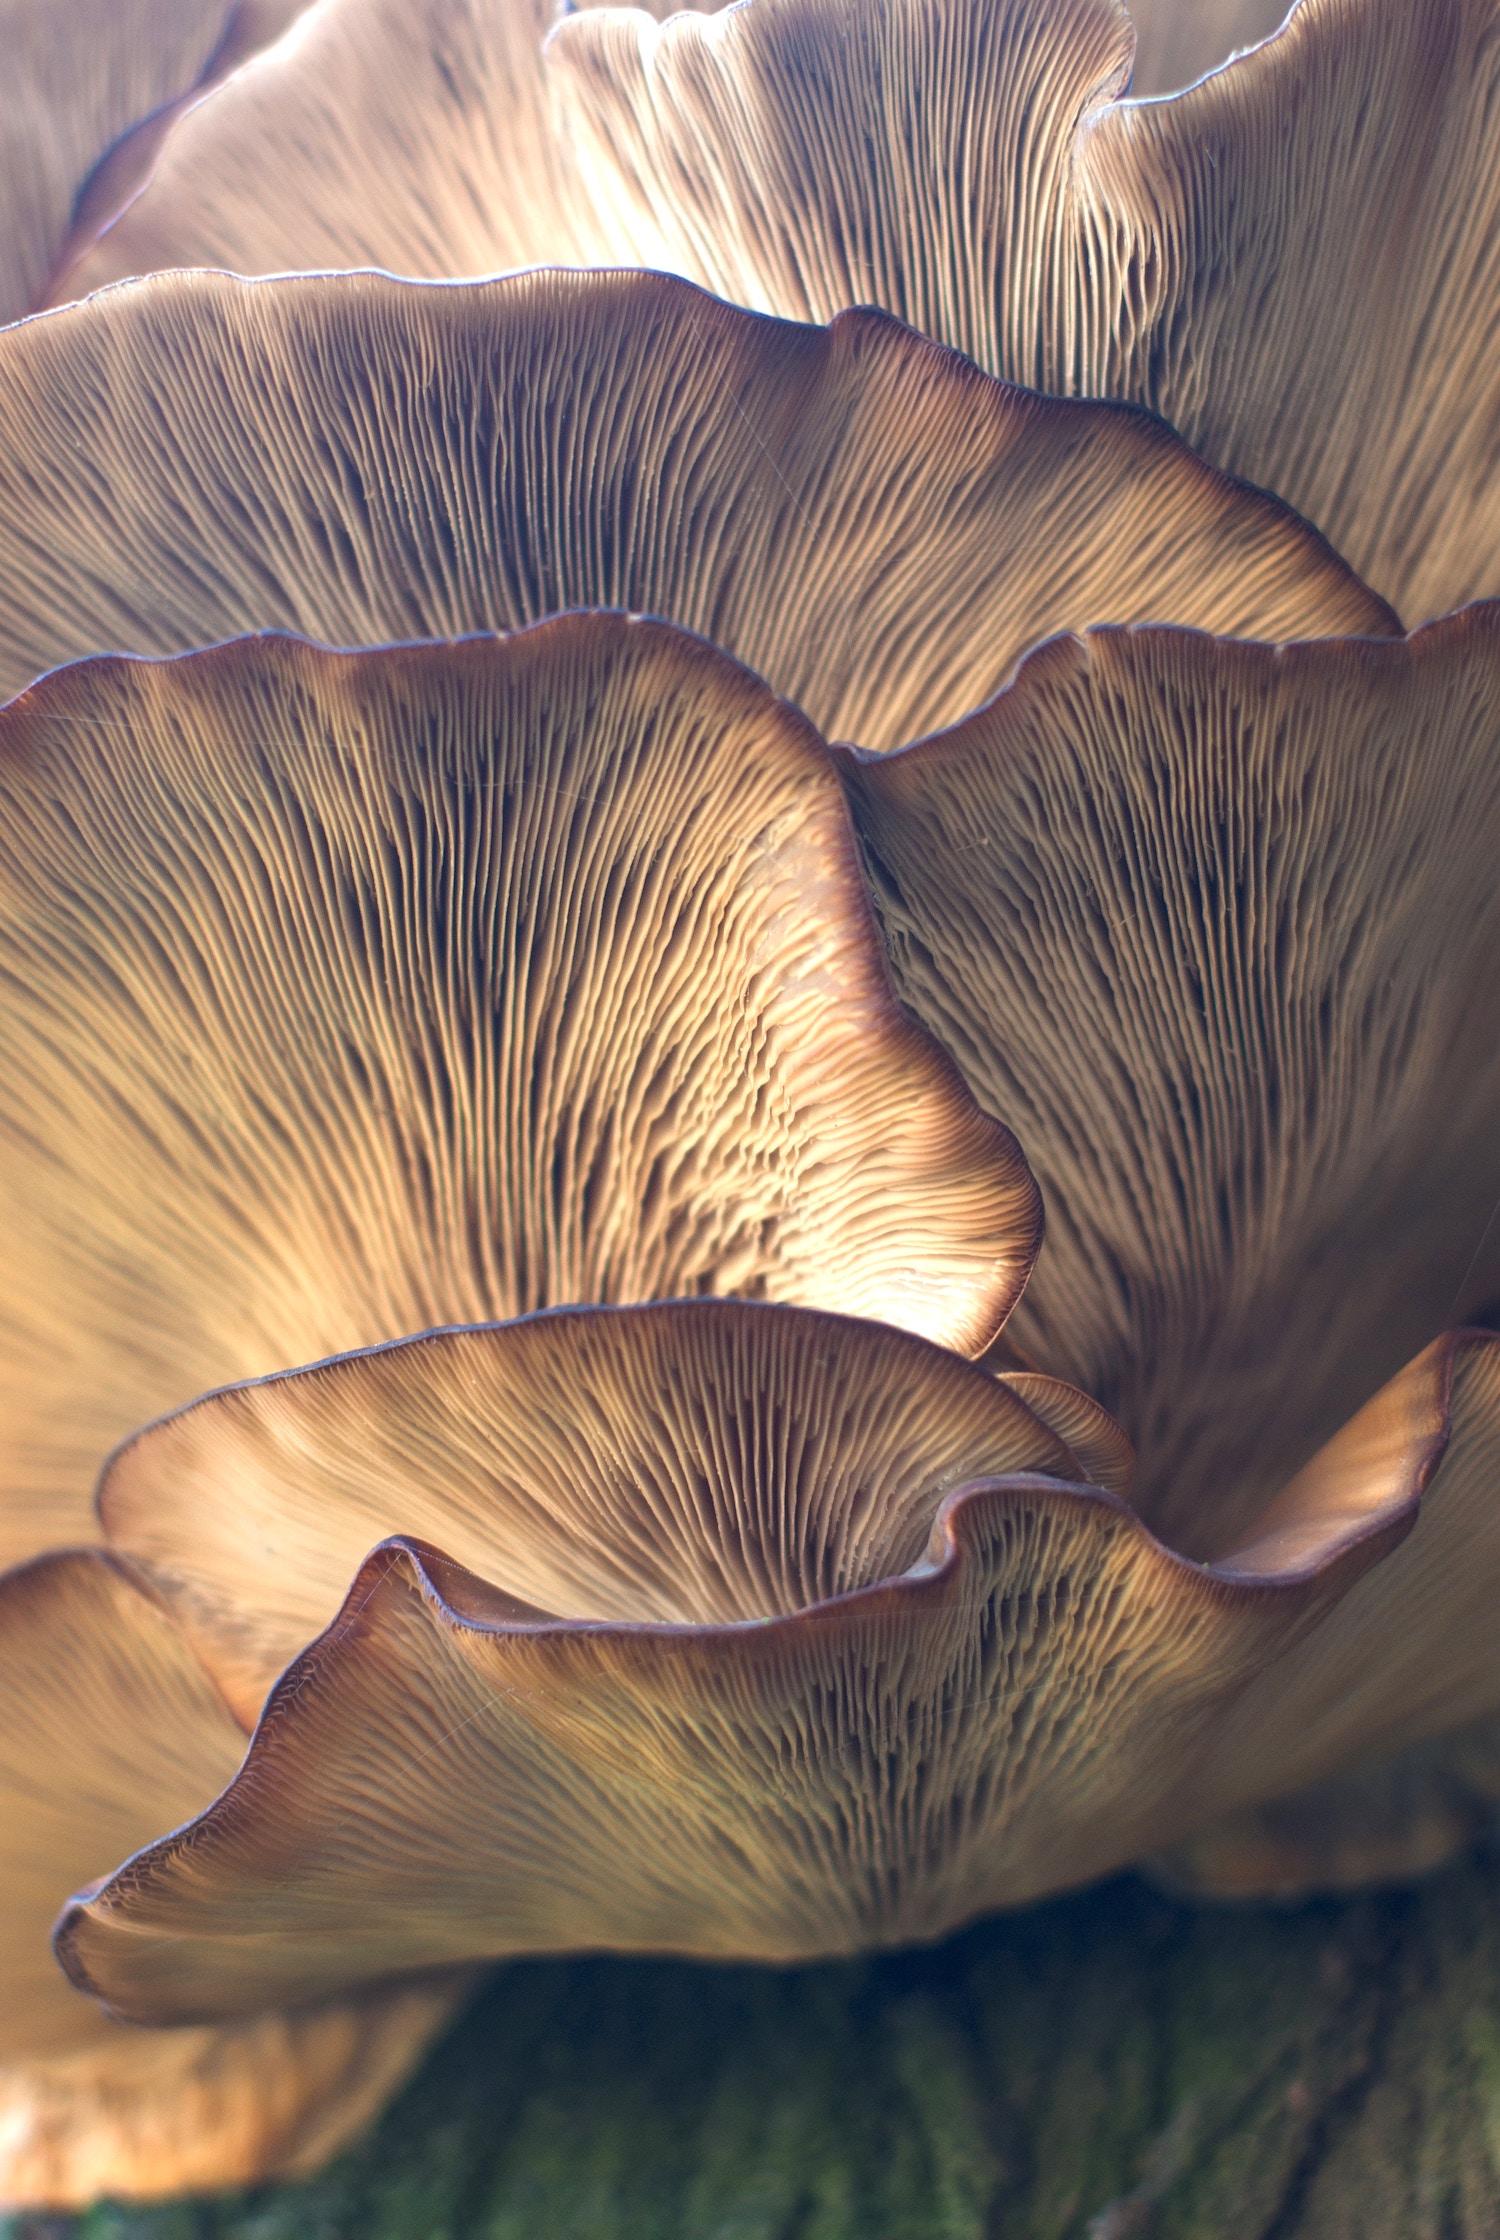 Oyster Mushrooms: Damir Omerovic, Unsplash.